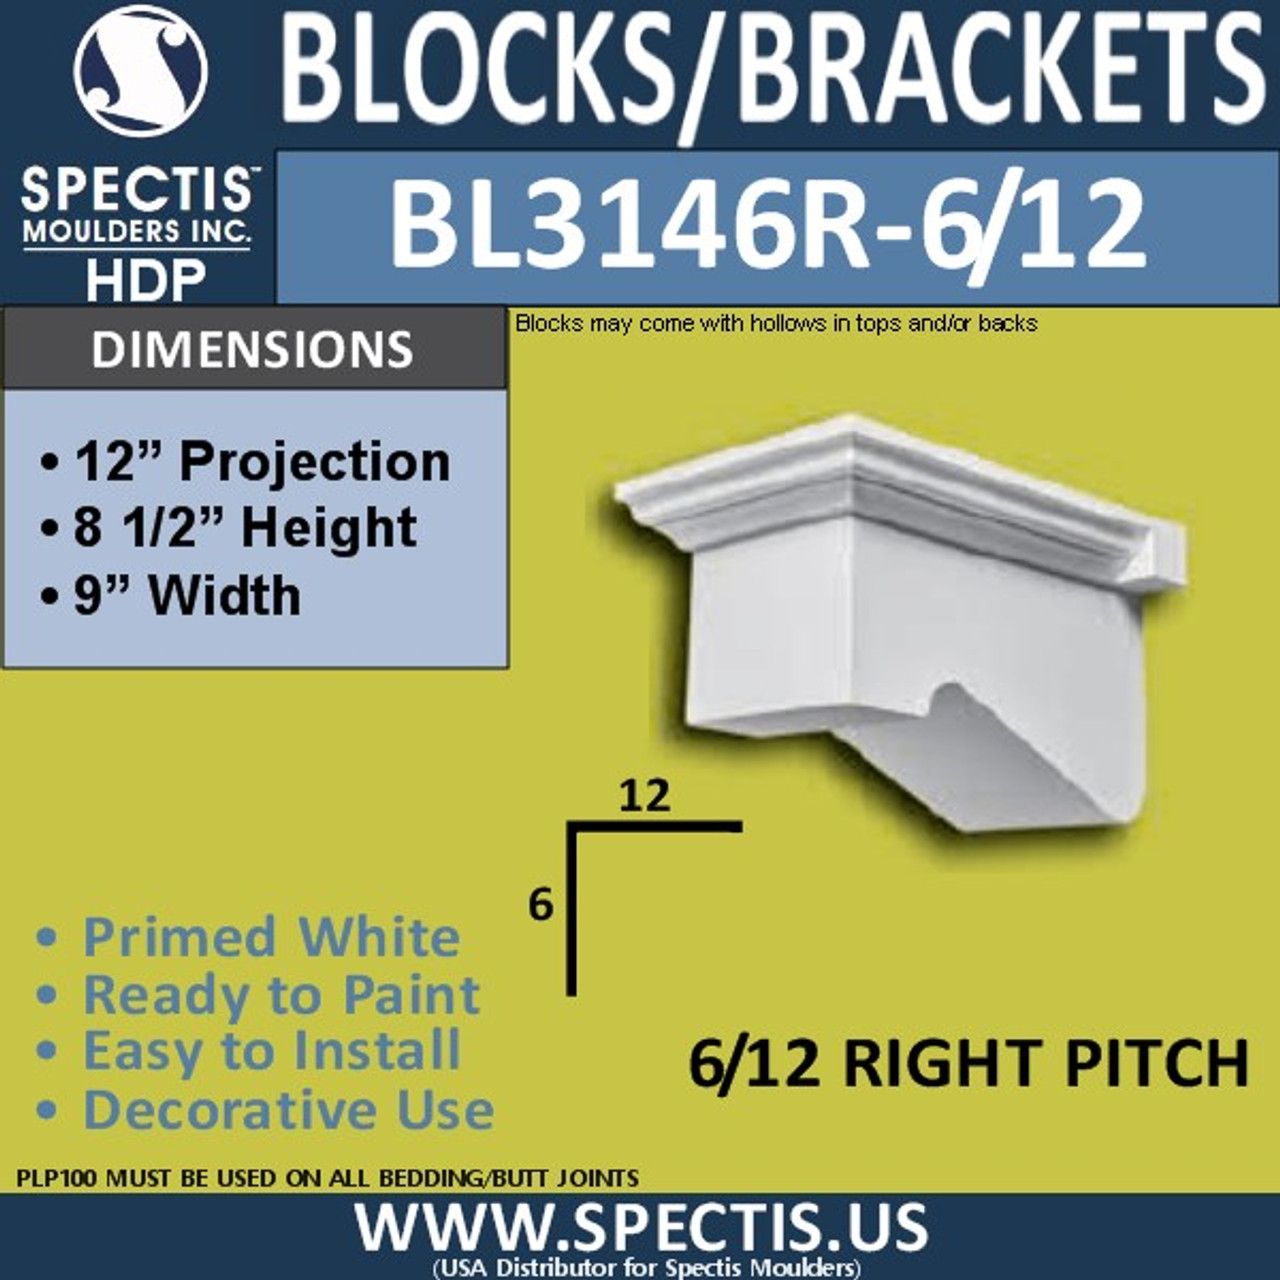 "BL3146R-6/12 Pitch Eave Block or Bracket 9""W x 8.5""H x 12""P"